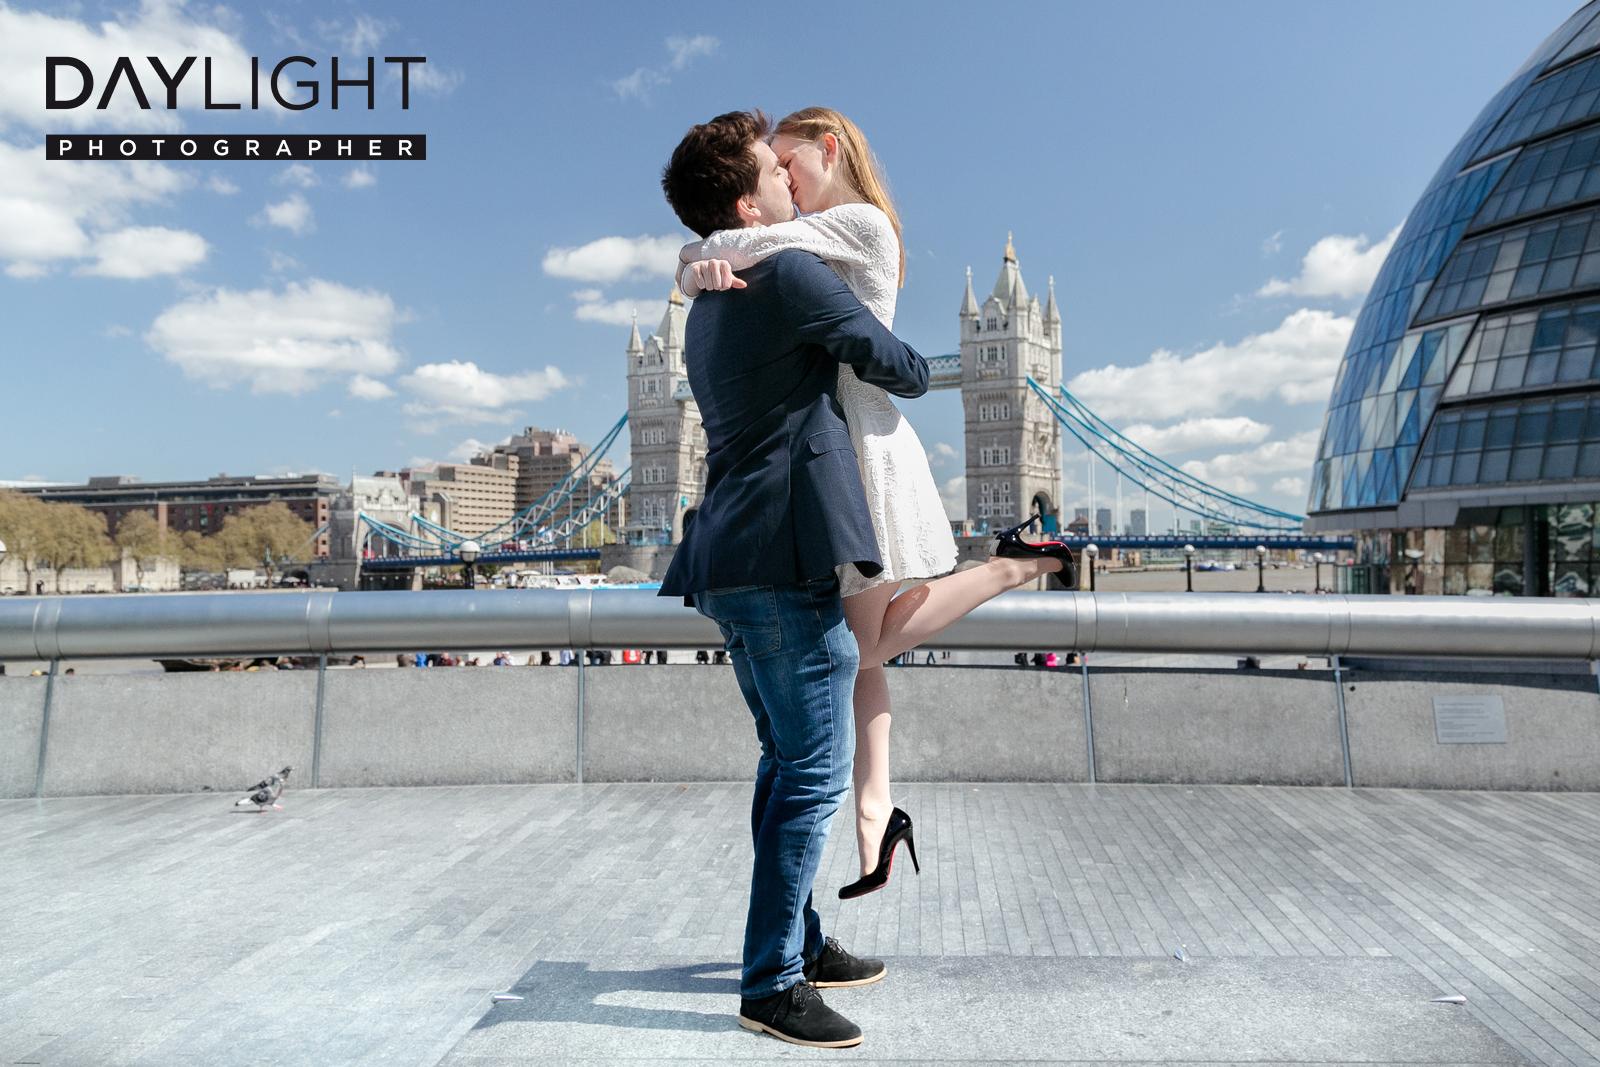 fotograf london paarfotoshooting